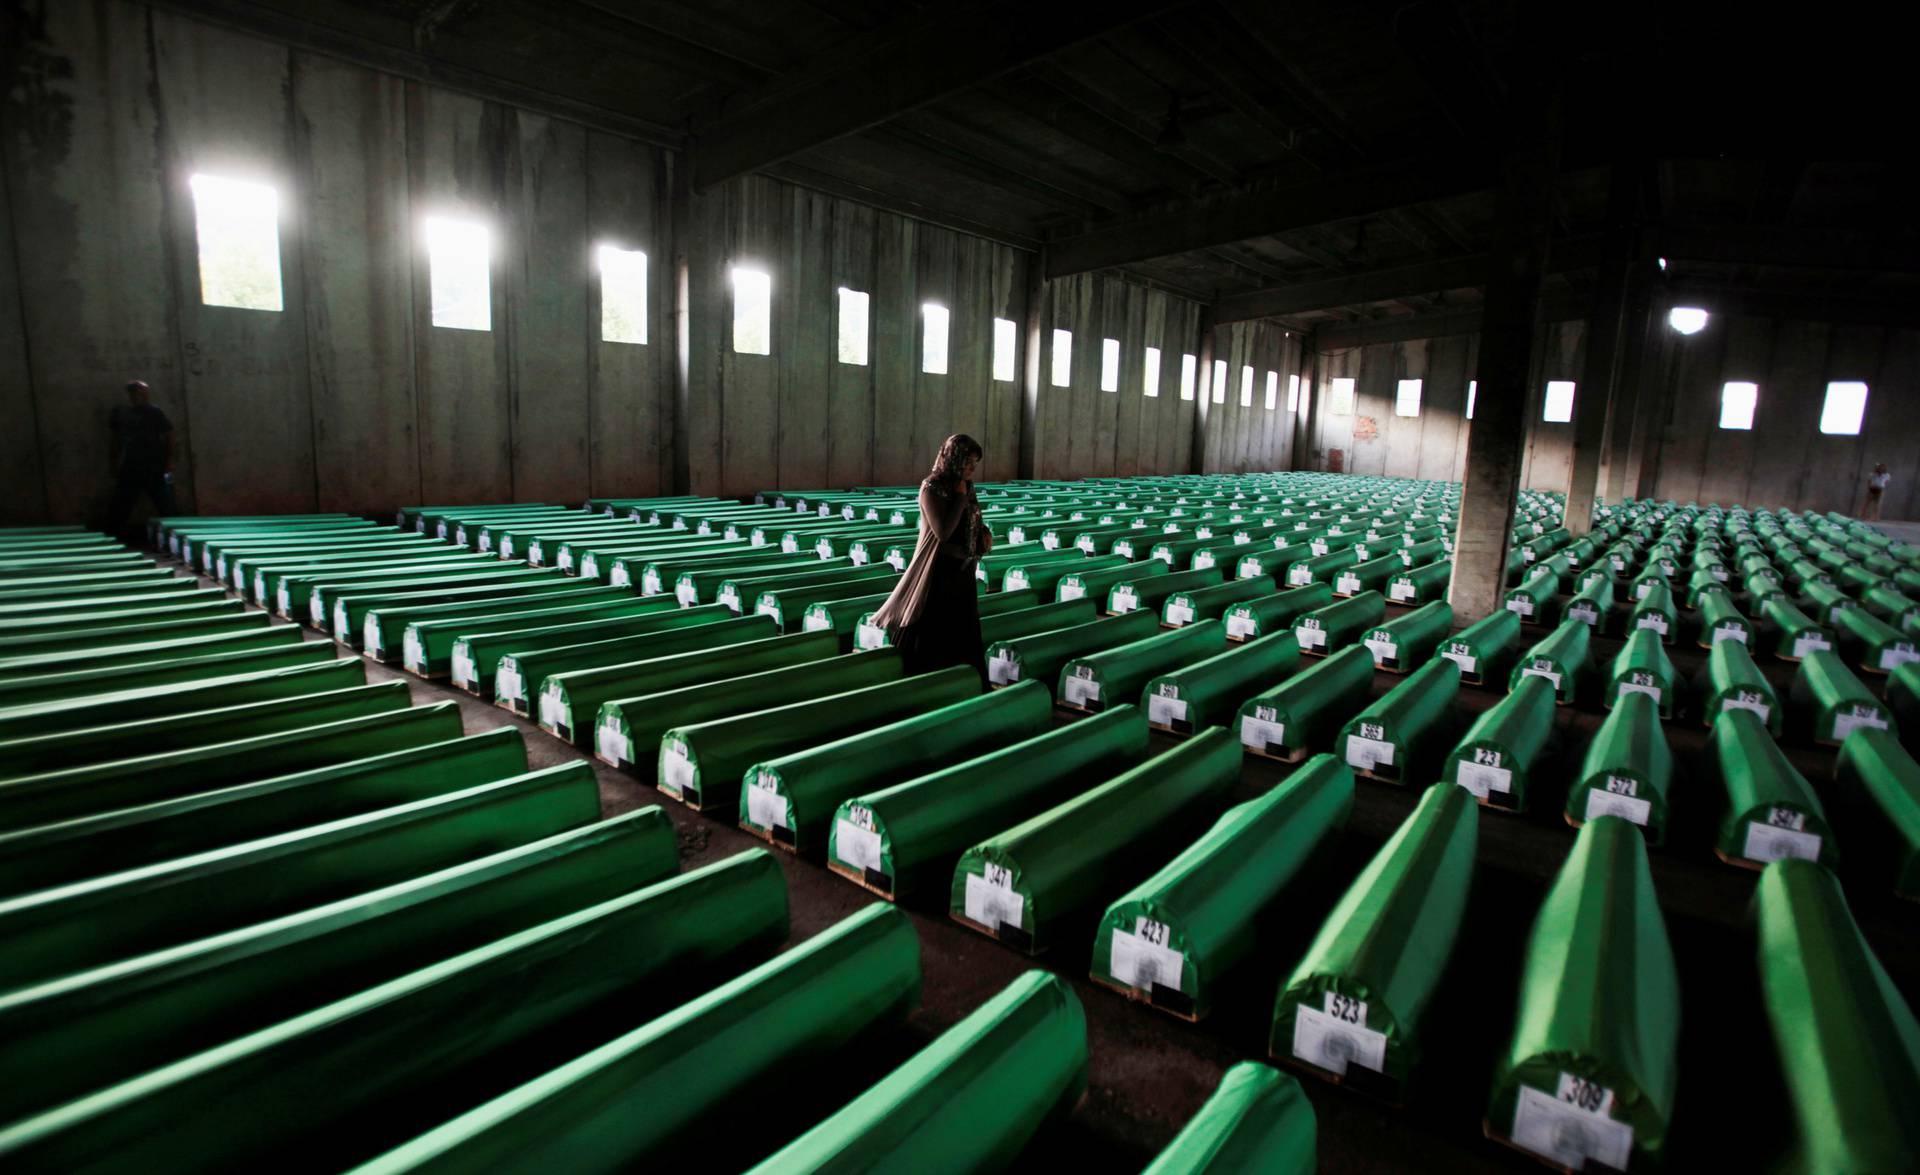 FILE PHOTO: Bosnian Muslim woman searches coffins in Potocari